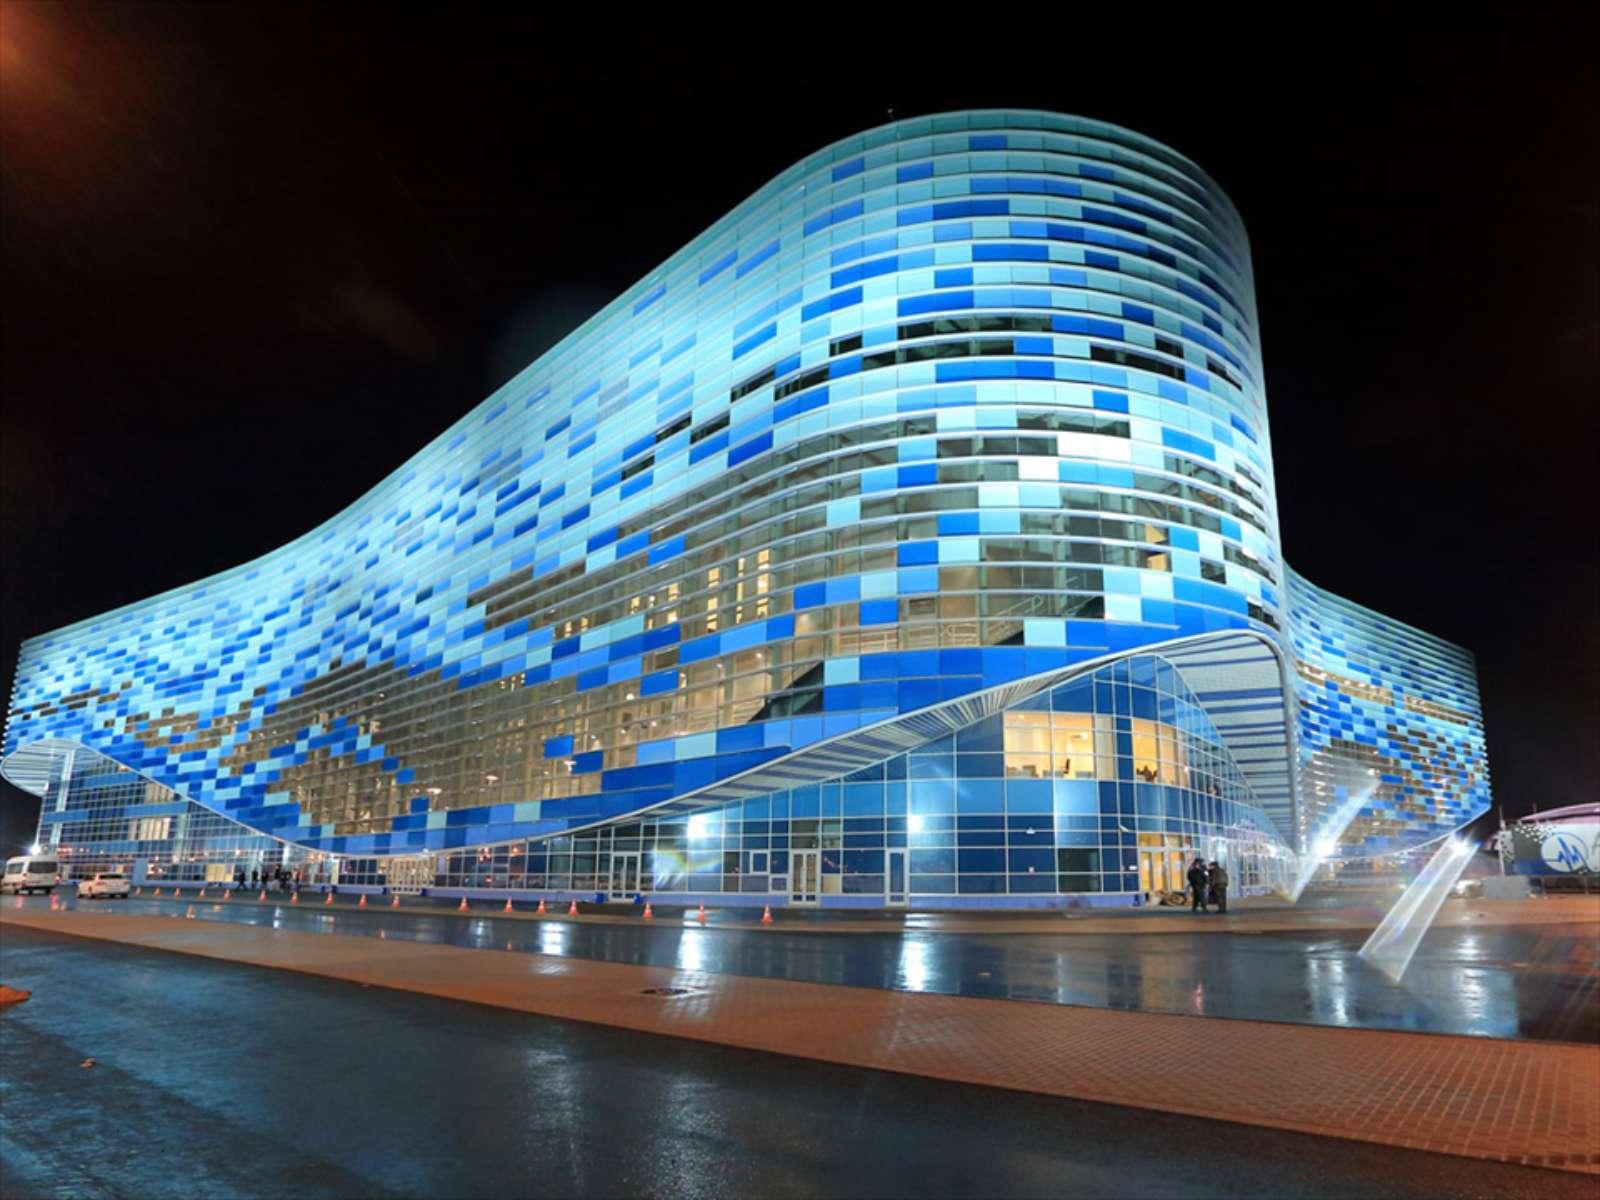 09-Sochi-2014-Olympics-Architecture-Iceberg-Skating-Palace